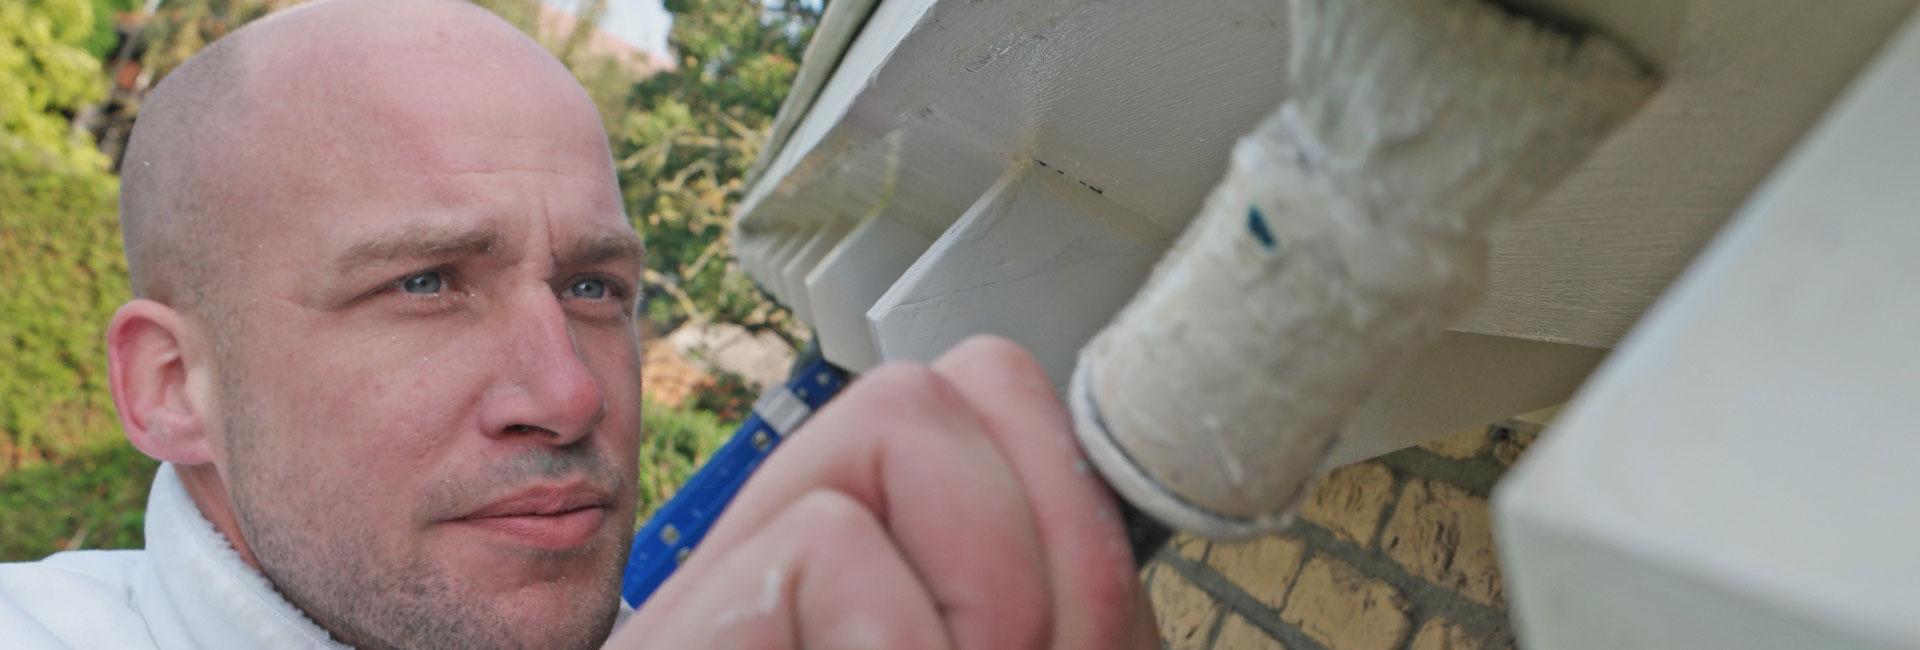 Qualité Schilders Hoorn - Binnenschilder - Buitenschilder - Spuitwerk